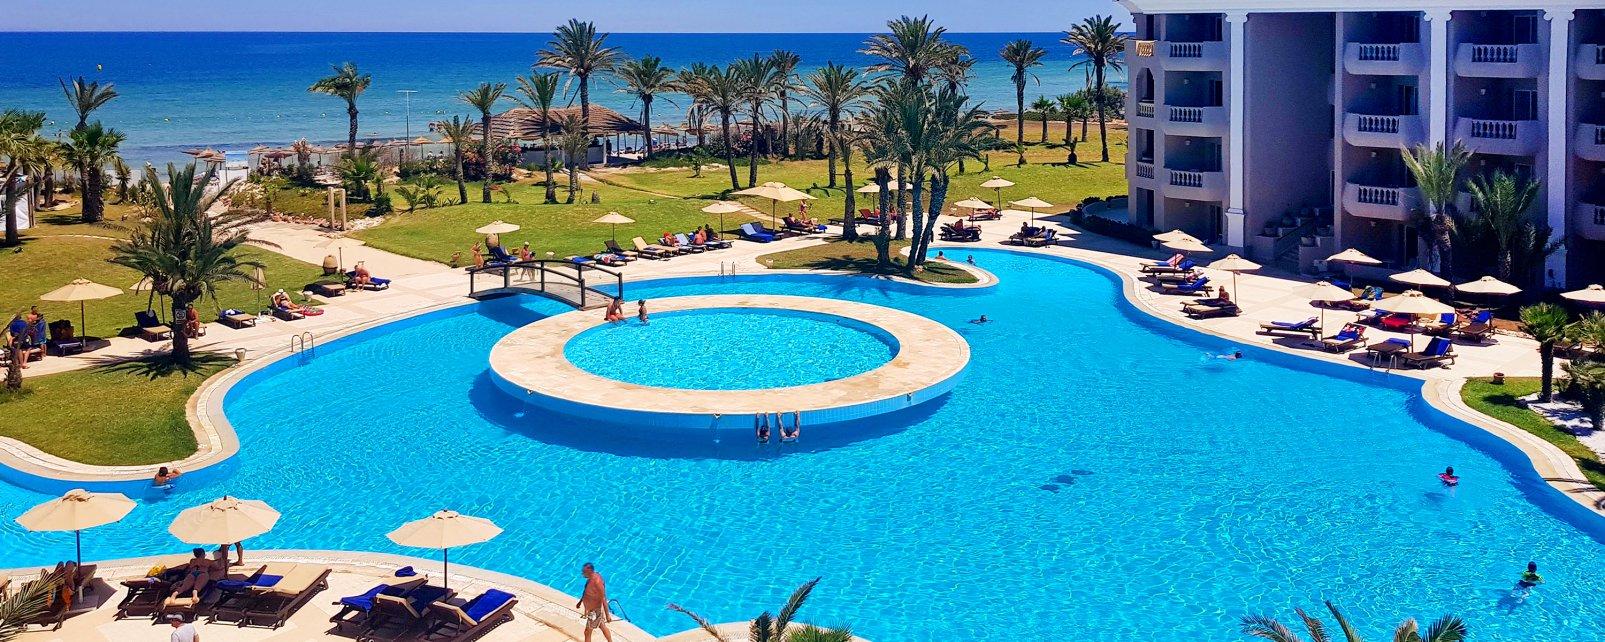 Hotel Royal Thalassa Monastir